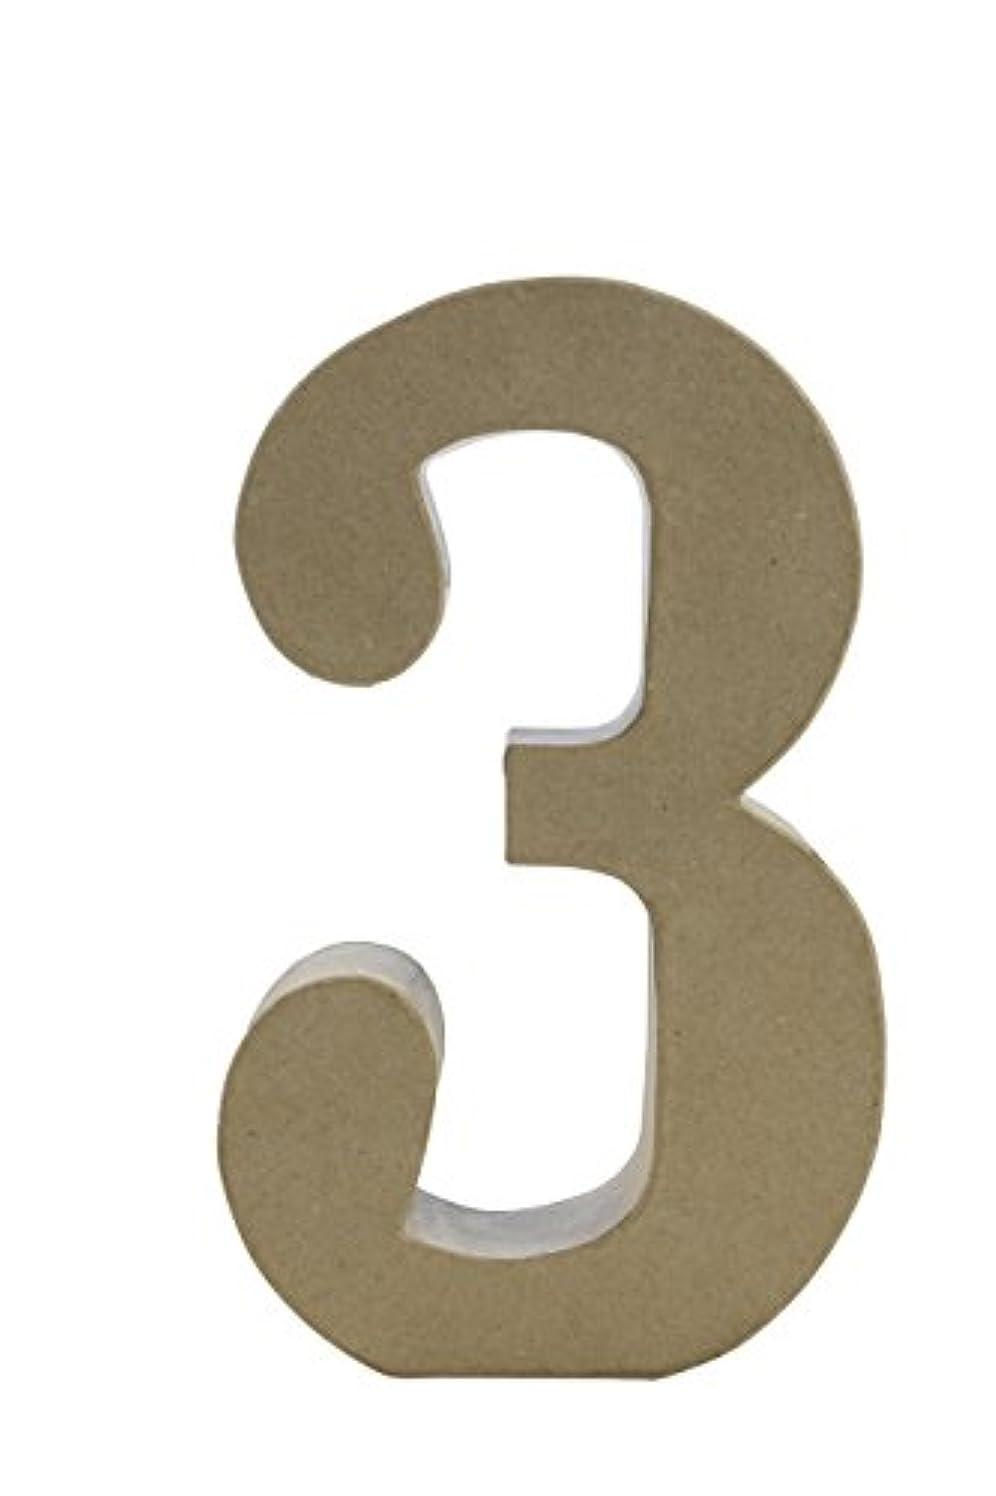 décopatch Mache Funny Number 3 (Three), 5 x 18 x 30 cm, Brown